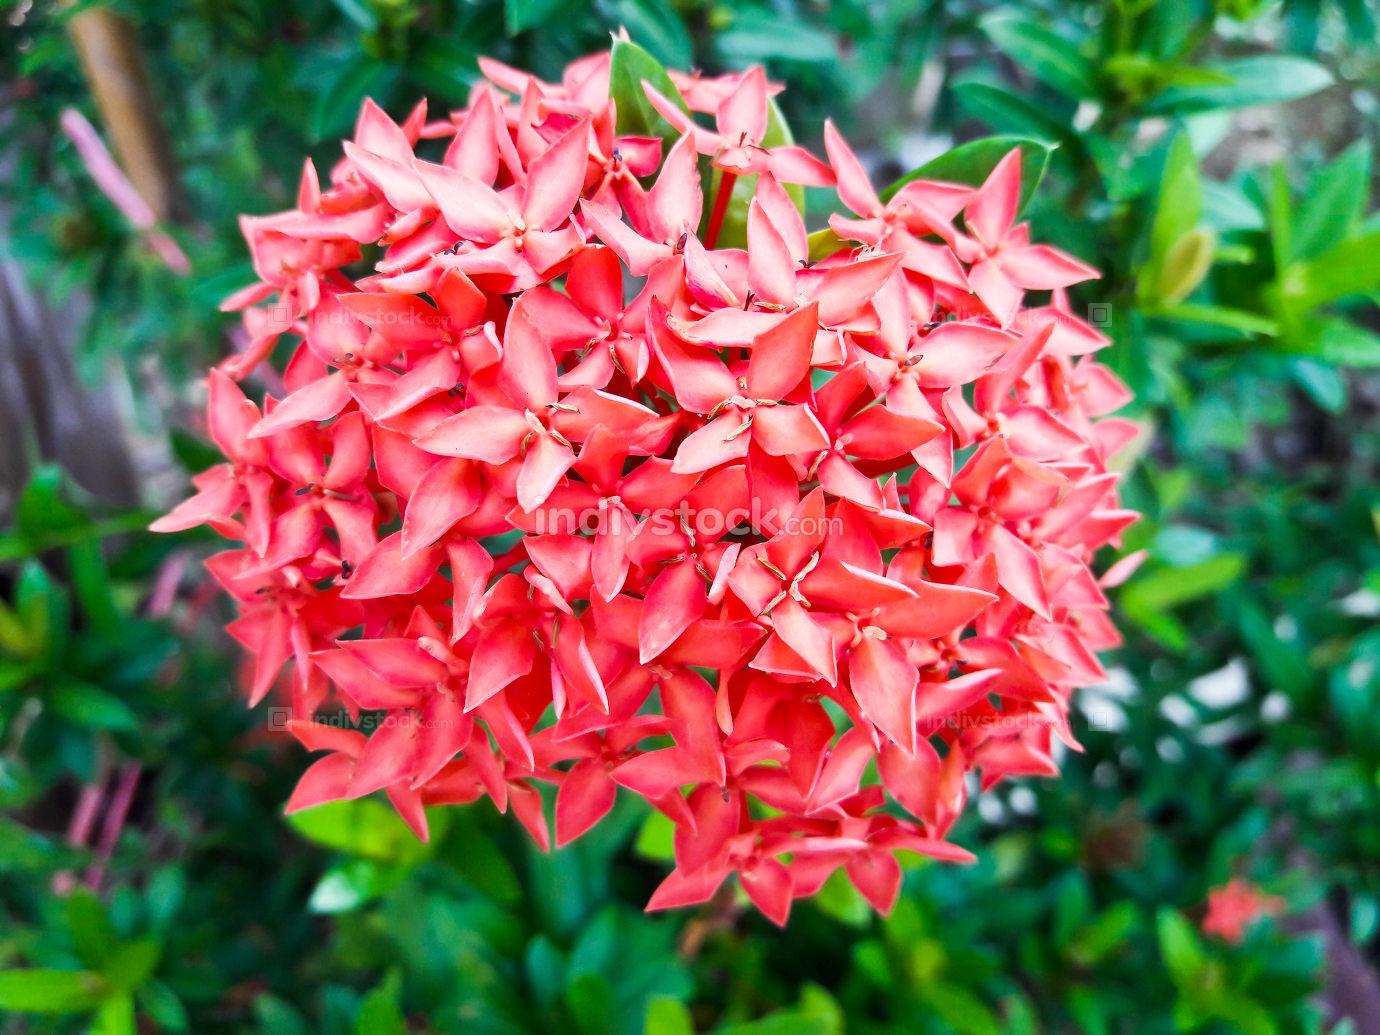 Ixora flower.Red spike flower. King Ixora blooming (Ixora chinen